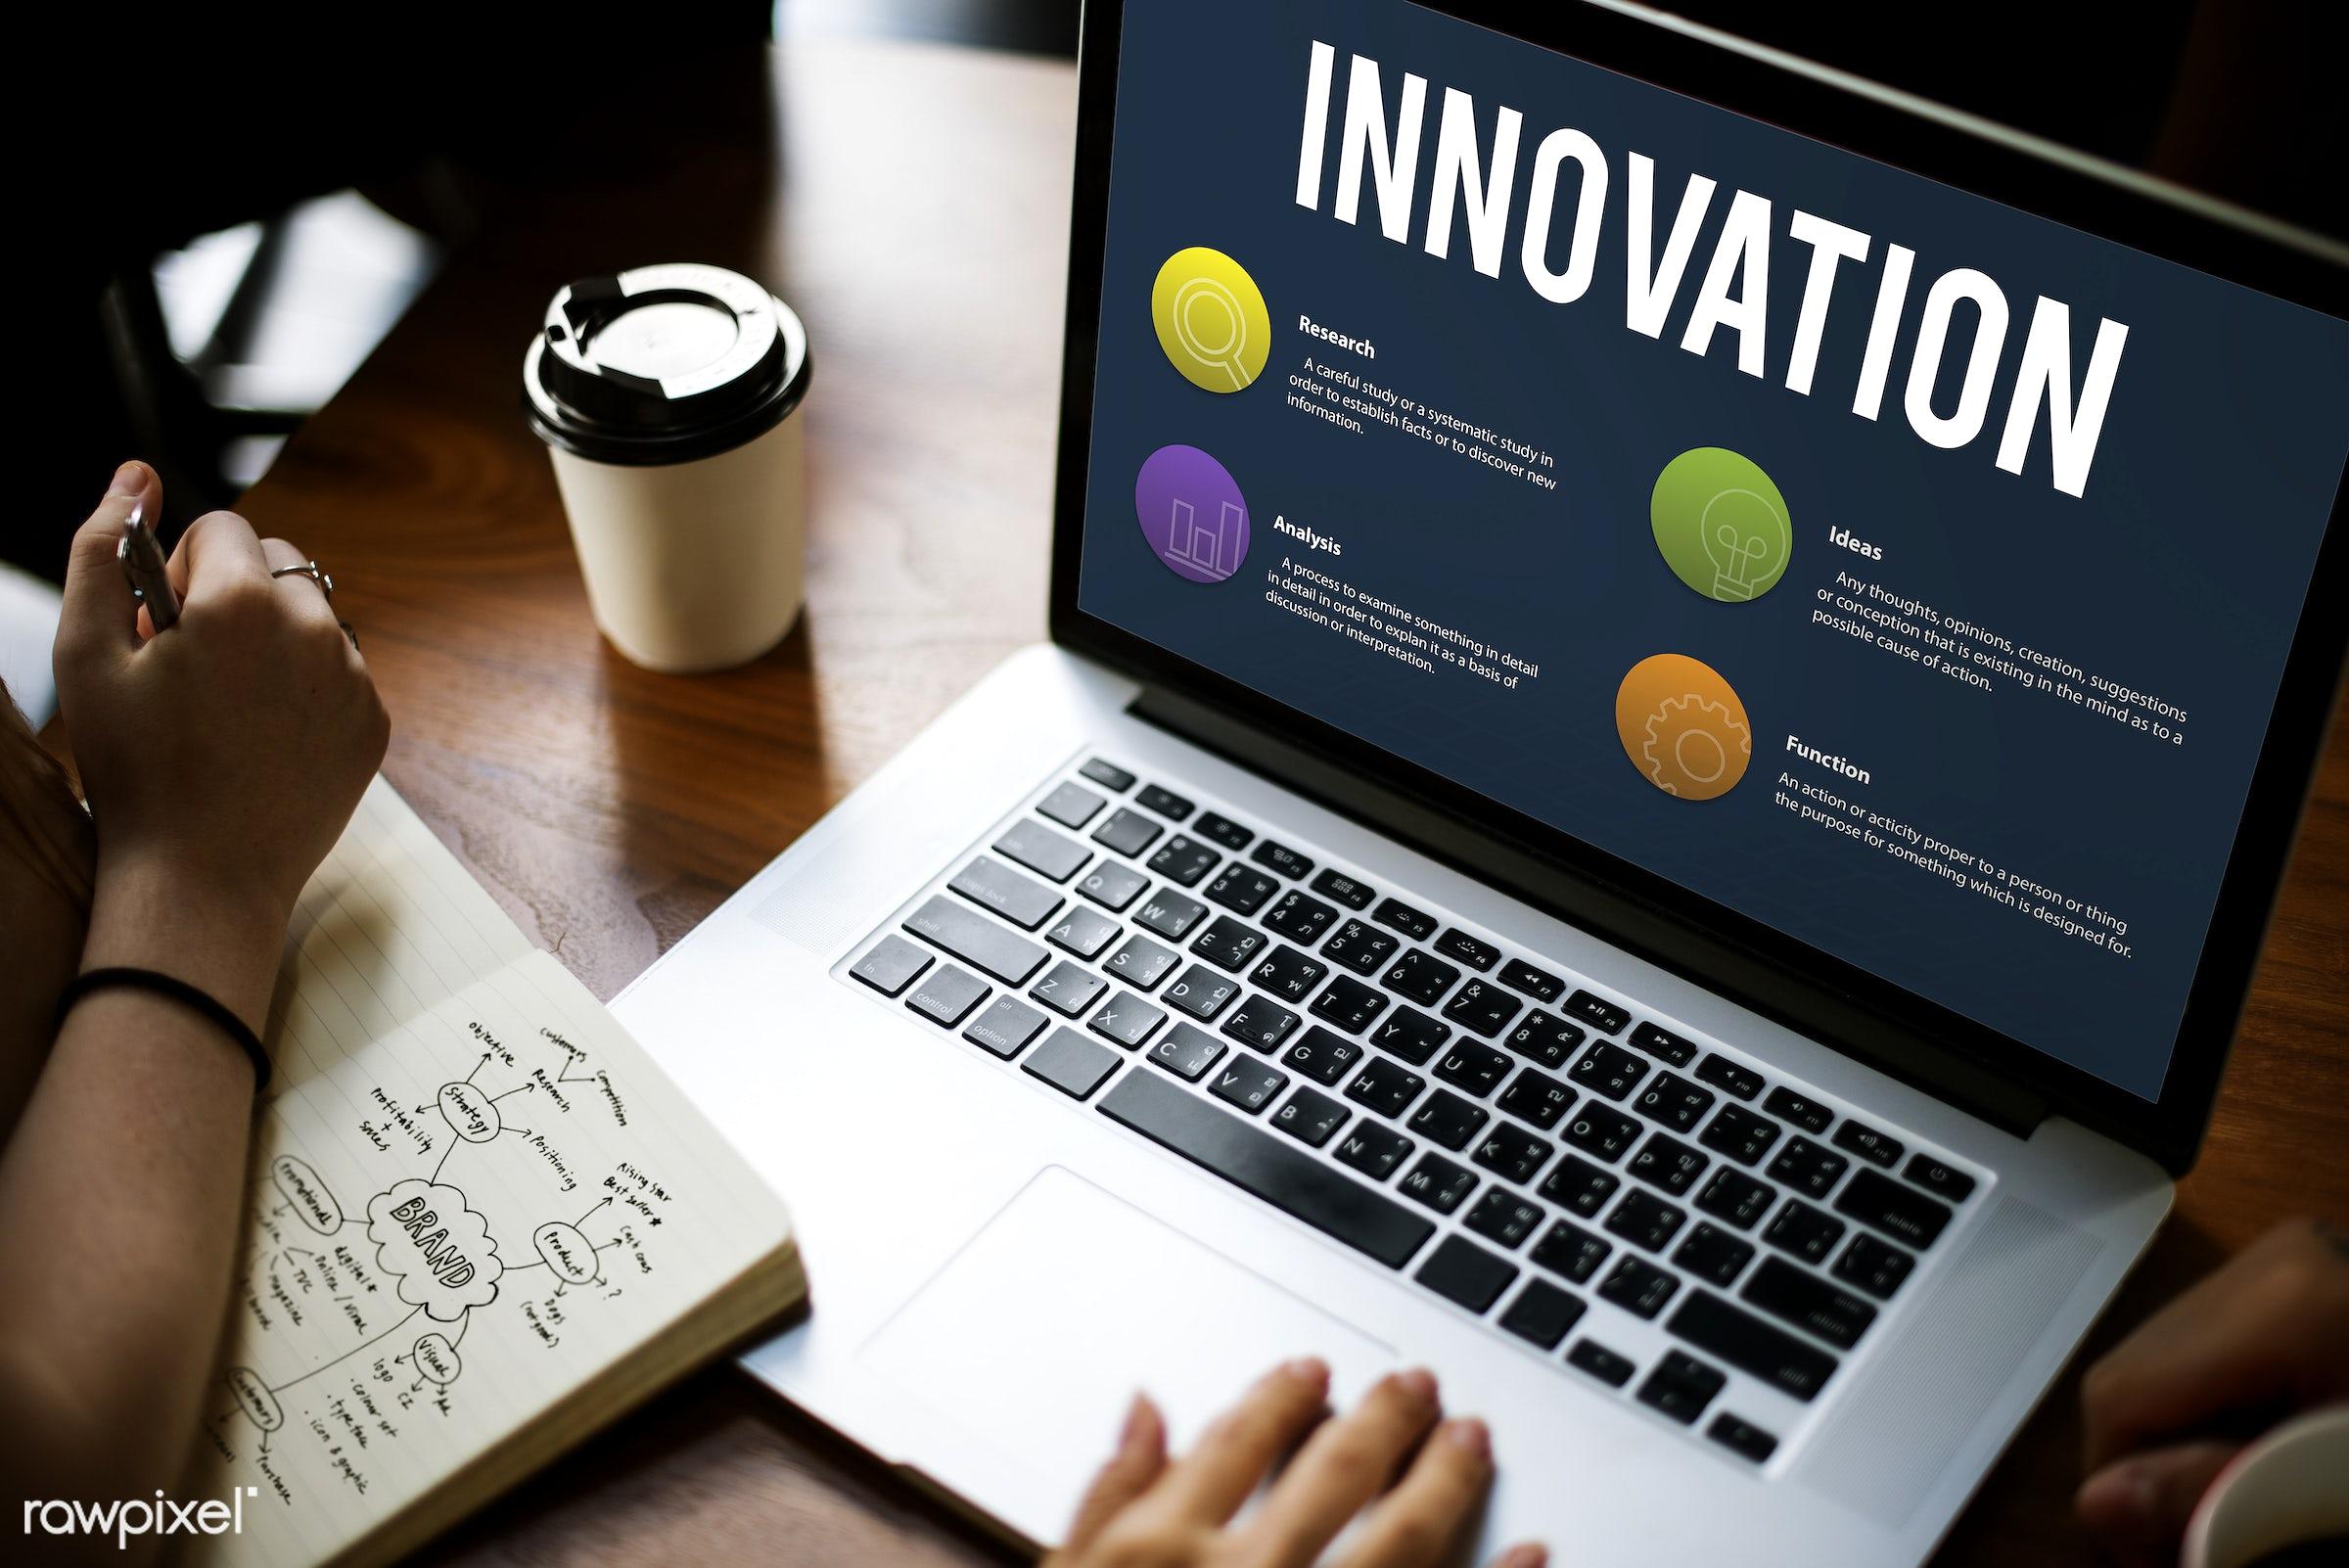 analysis, branding, browsing, business, coffee cup, development, device, digital, digital device, function, goals, hands,...